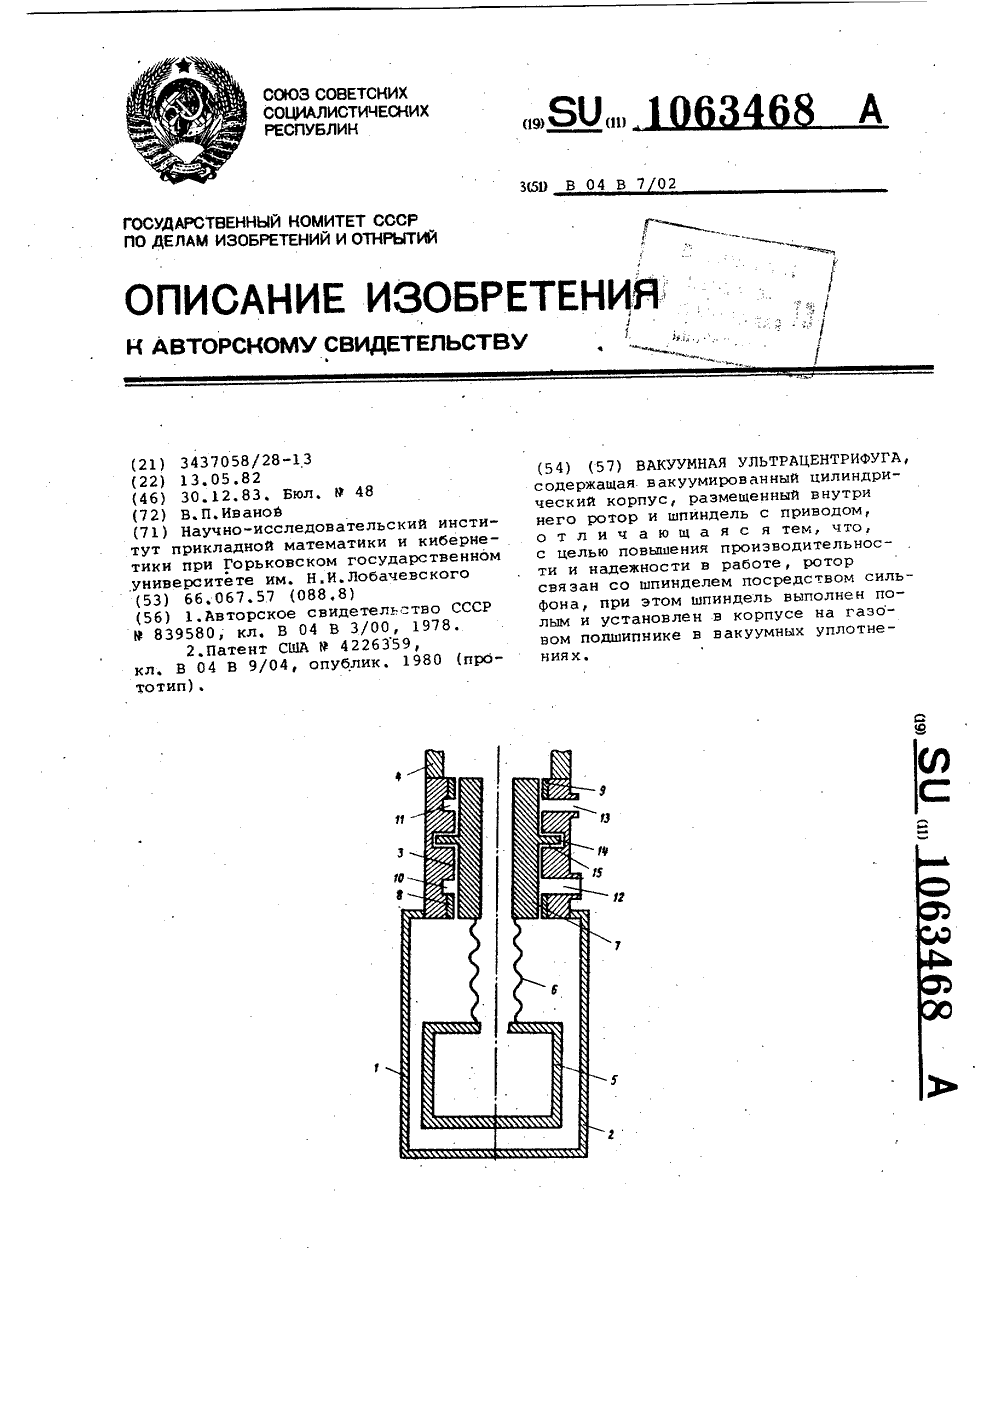 Ультрацентрифуга